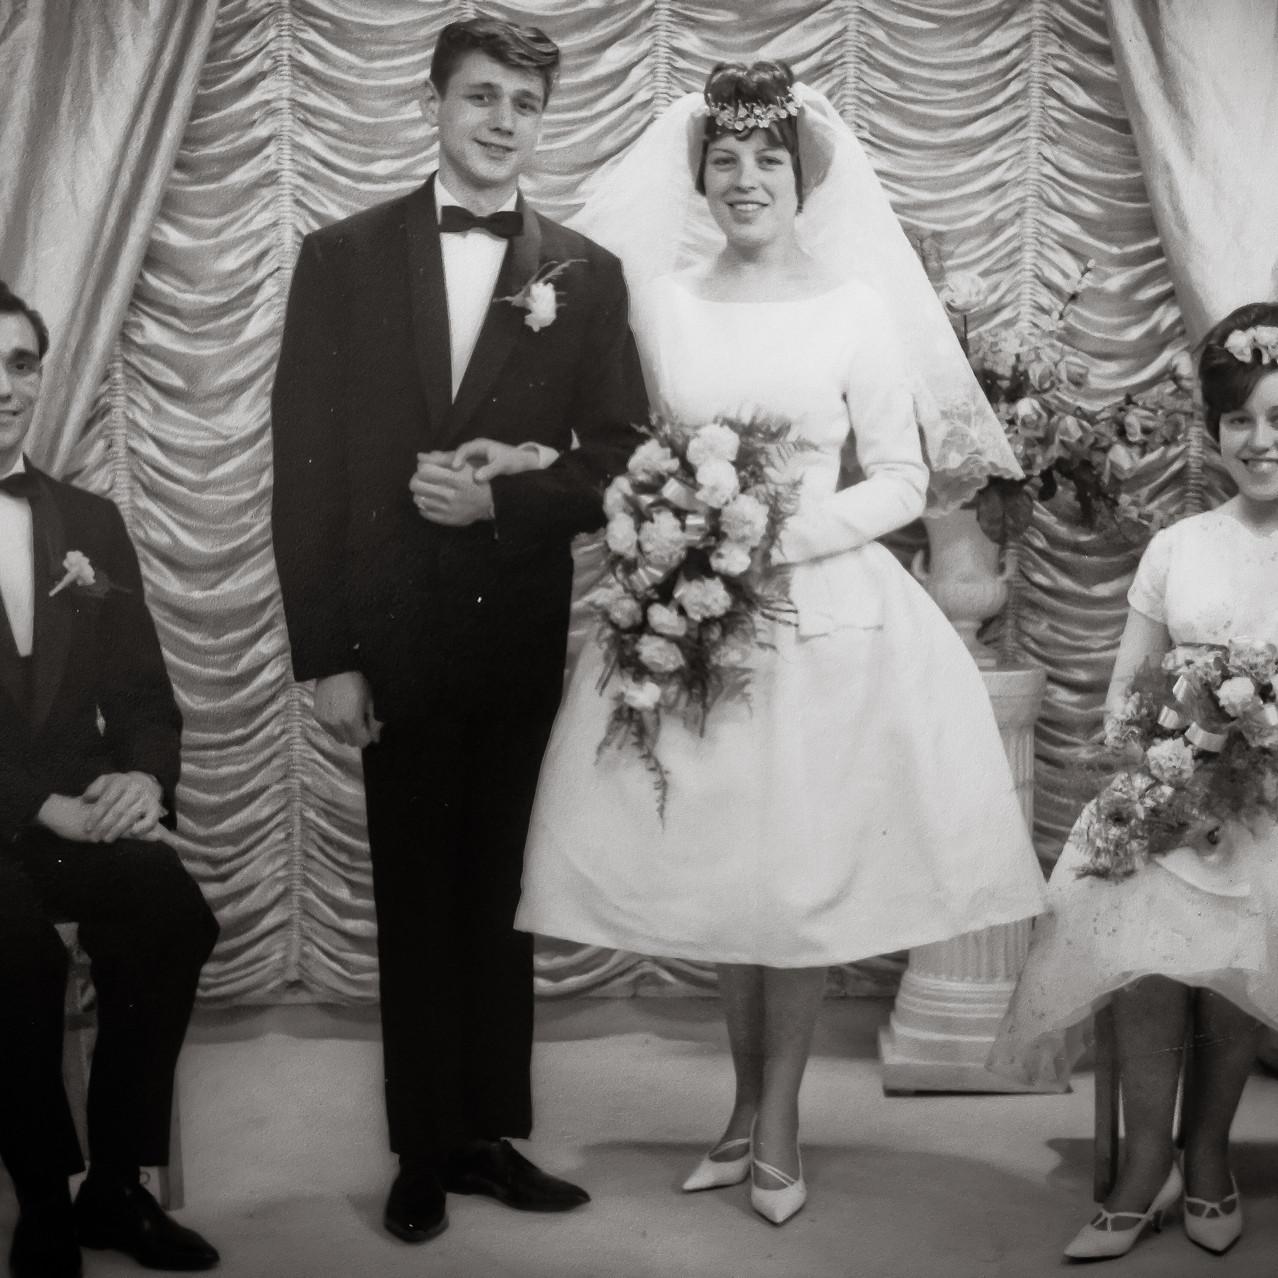 Granny & Grandads Wedding Photos (1 of 6